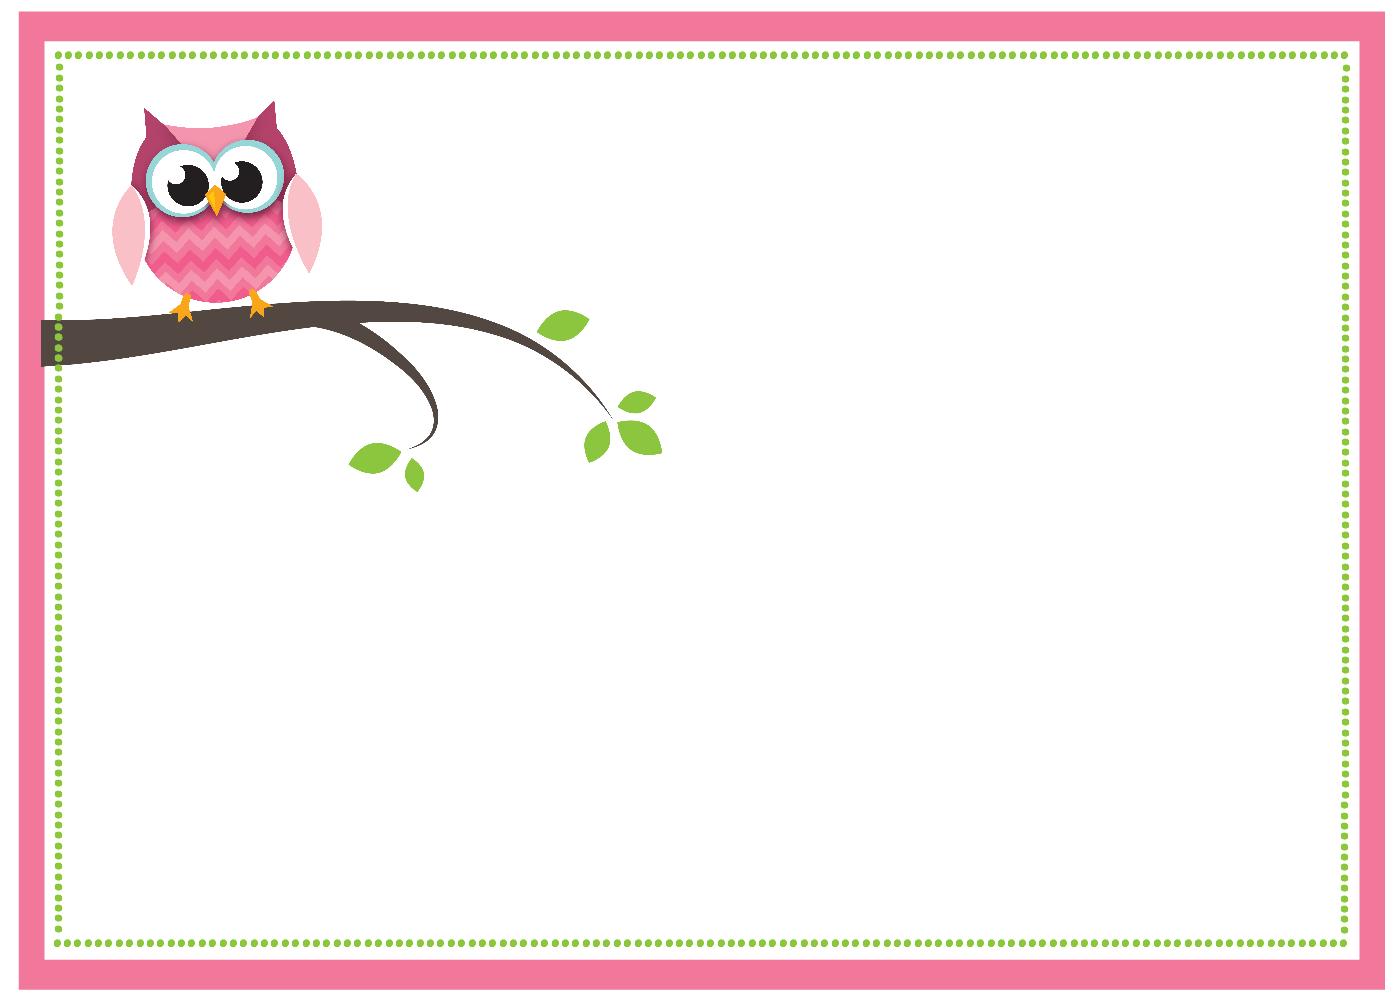 Free Printable Owl Baby Shower Invitations {& Other Printables} - Free Printable Blank Baby Shower Invitations